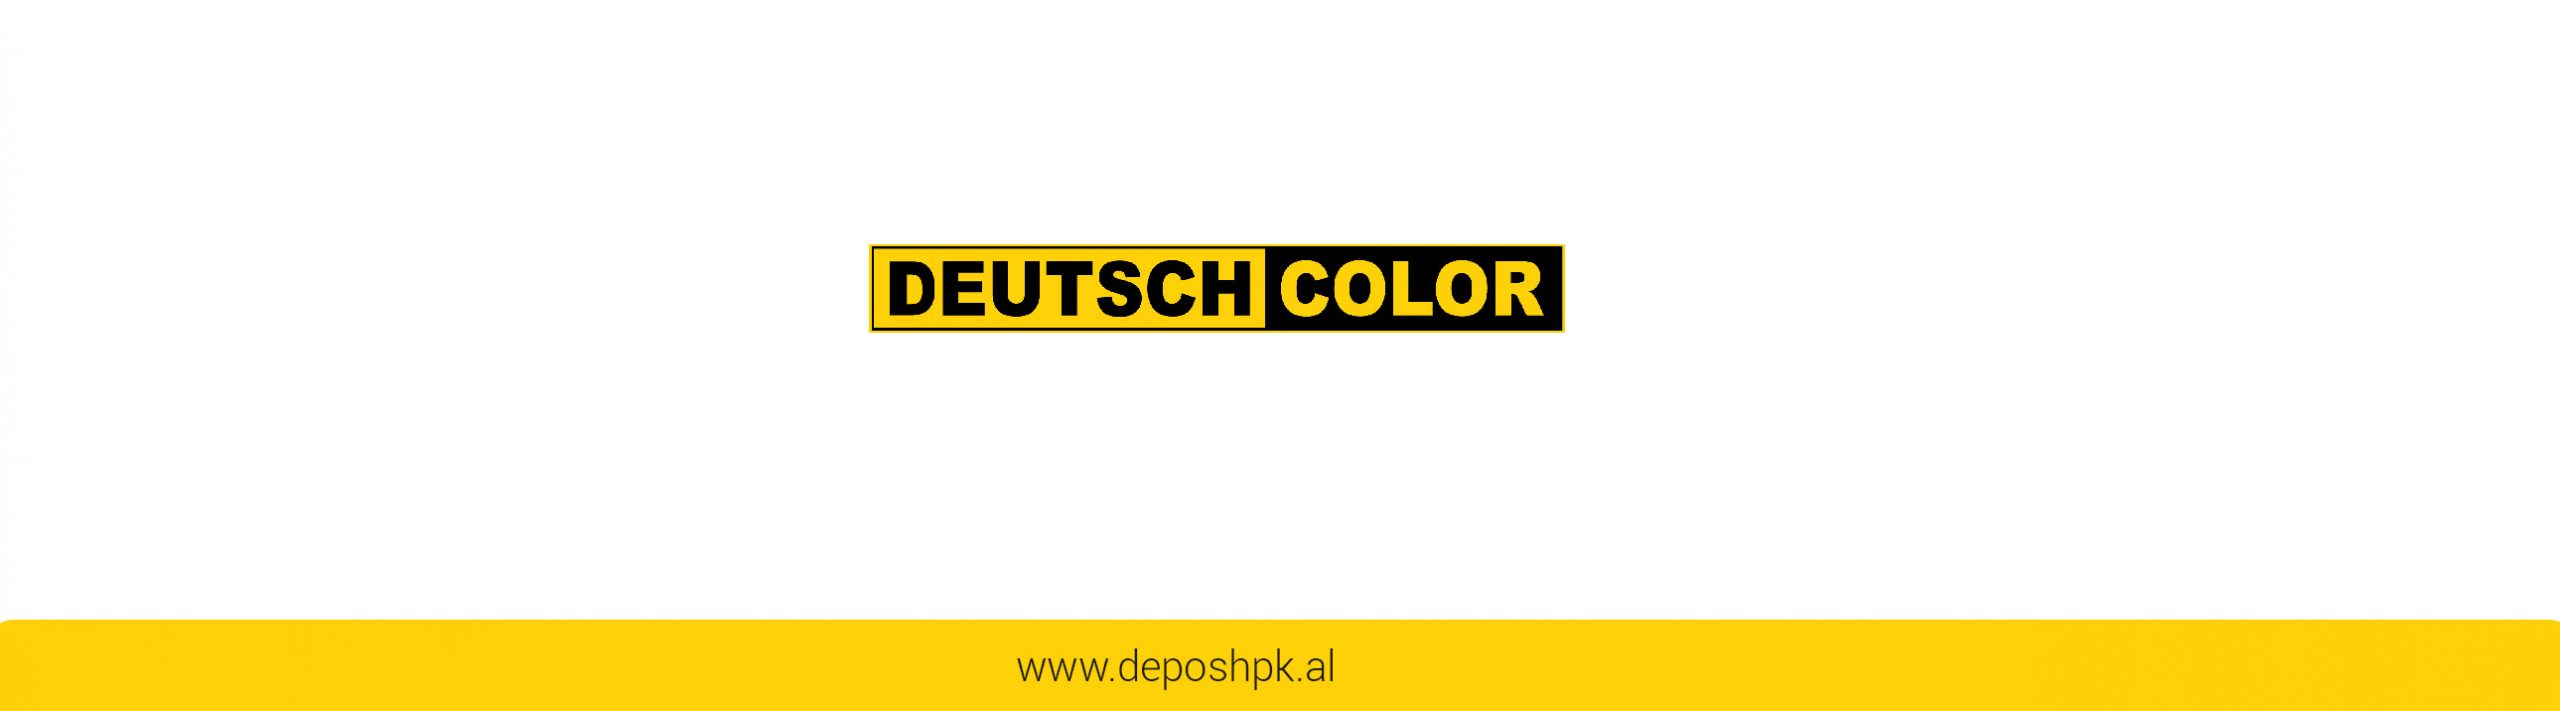 https://www.deposhpk.al/wp-content/uploads/2019/12/deutschcolor-produkt-deposhpk.al_-scaled.jpg